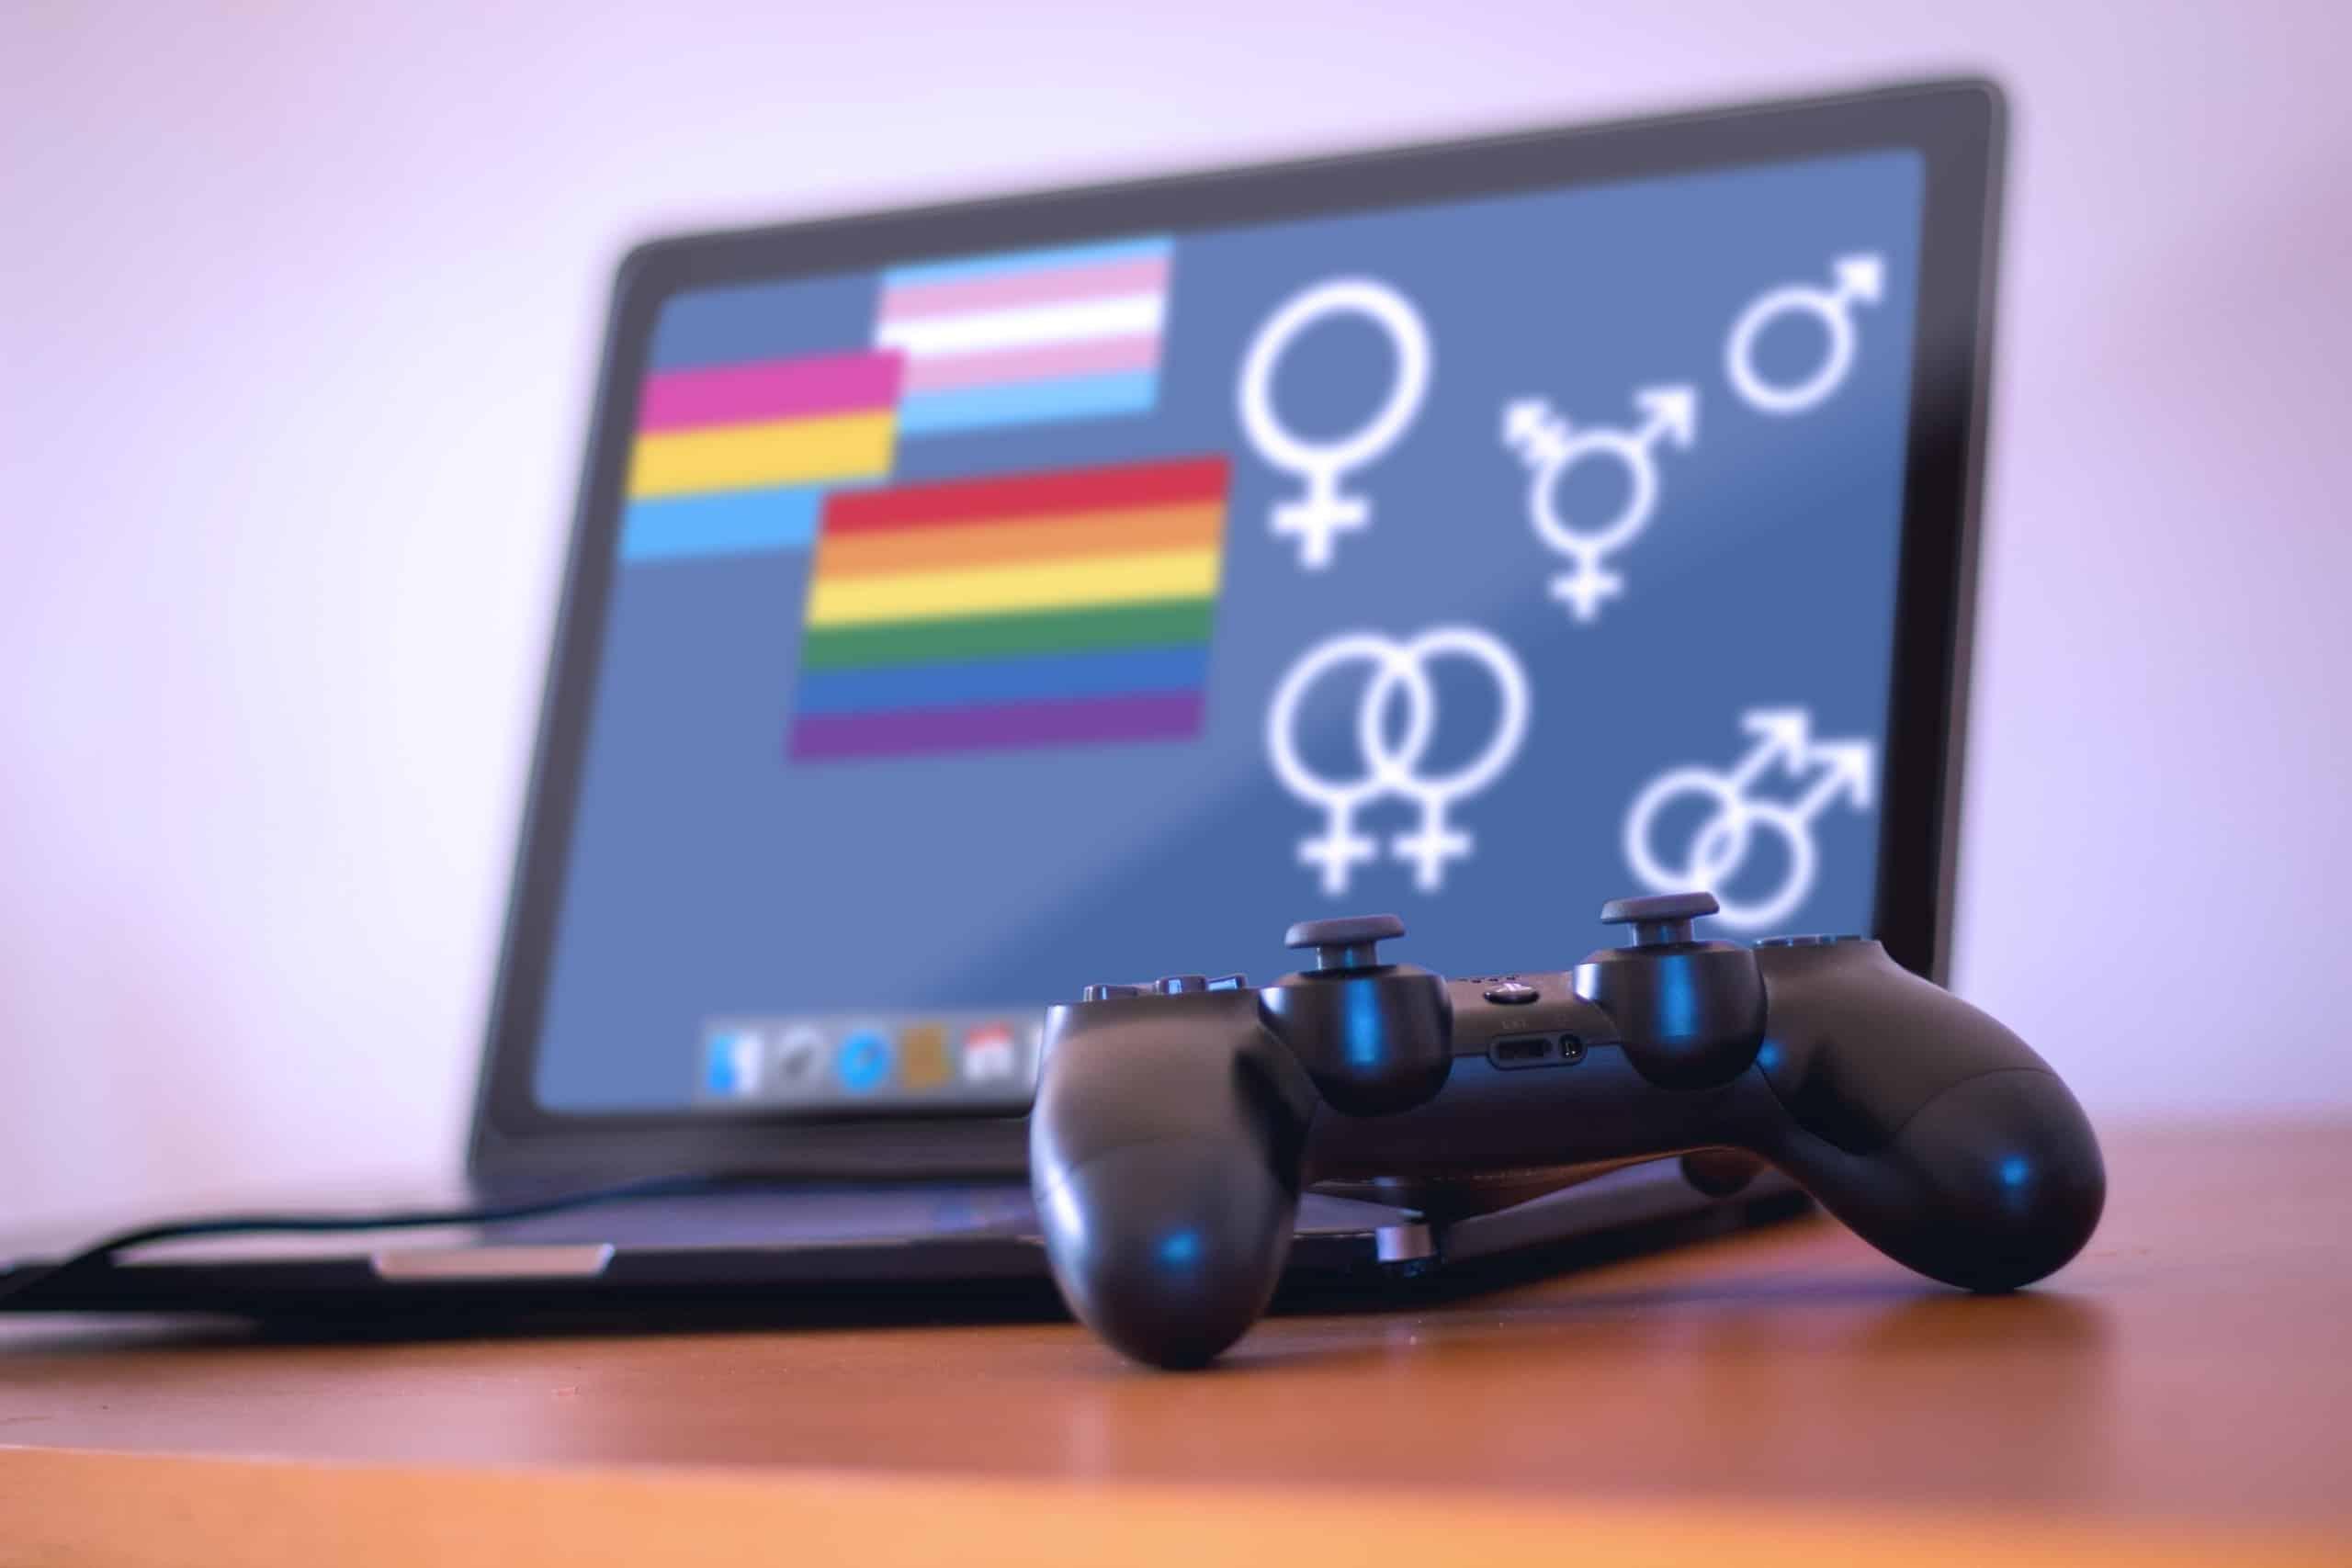 Es gibt auch Queere Charaktere in Videogames